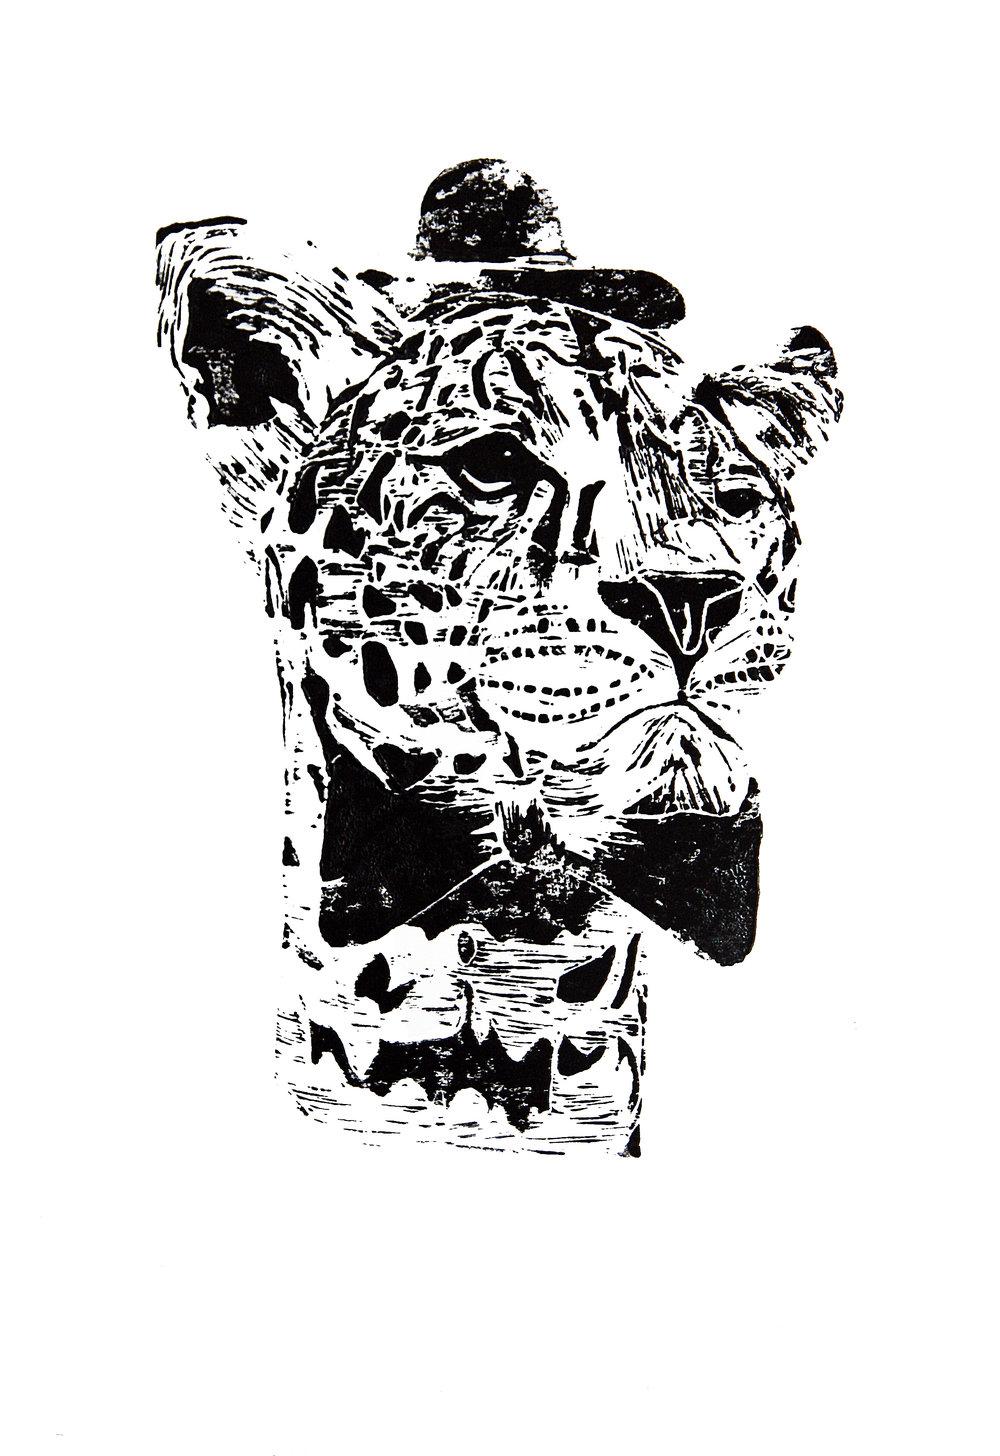 'Mr Leopard' (black), linocut print on paper,  42cm x 59.4cm, 2016